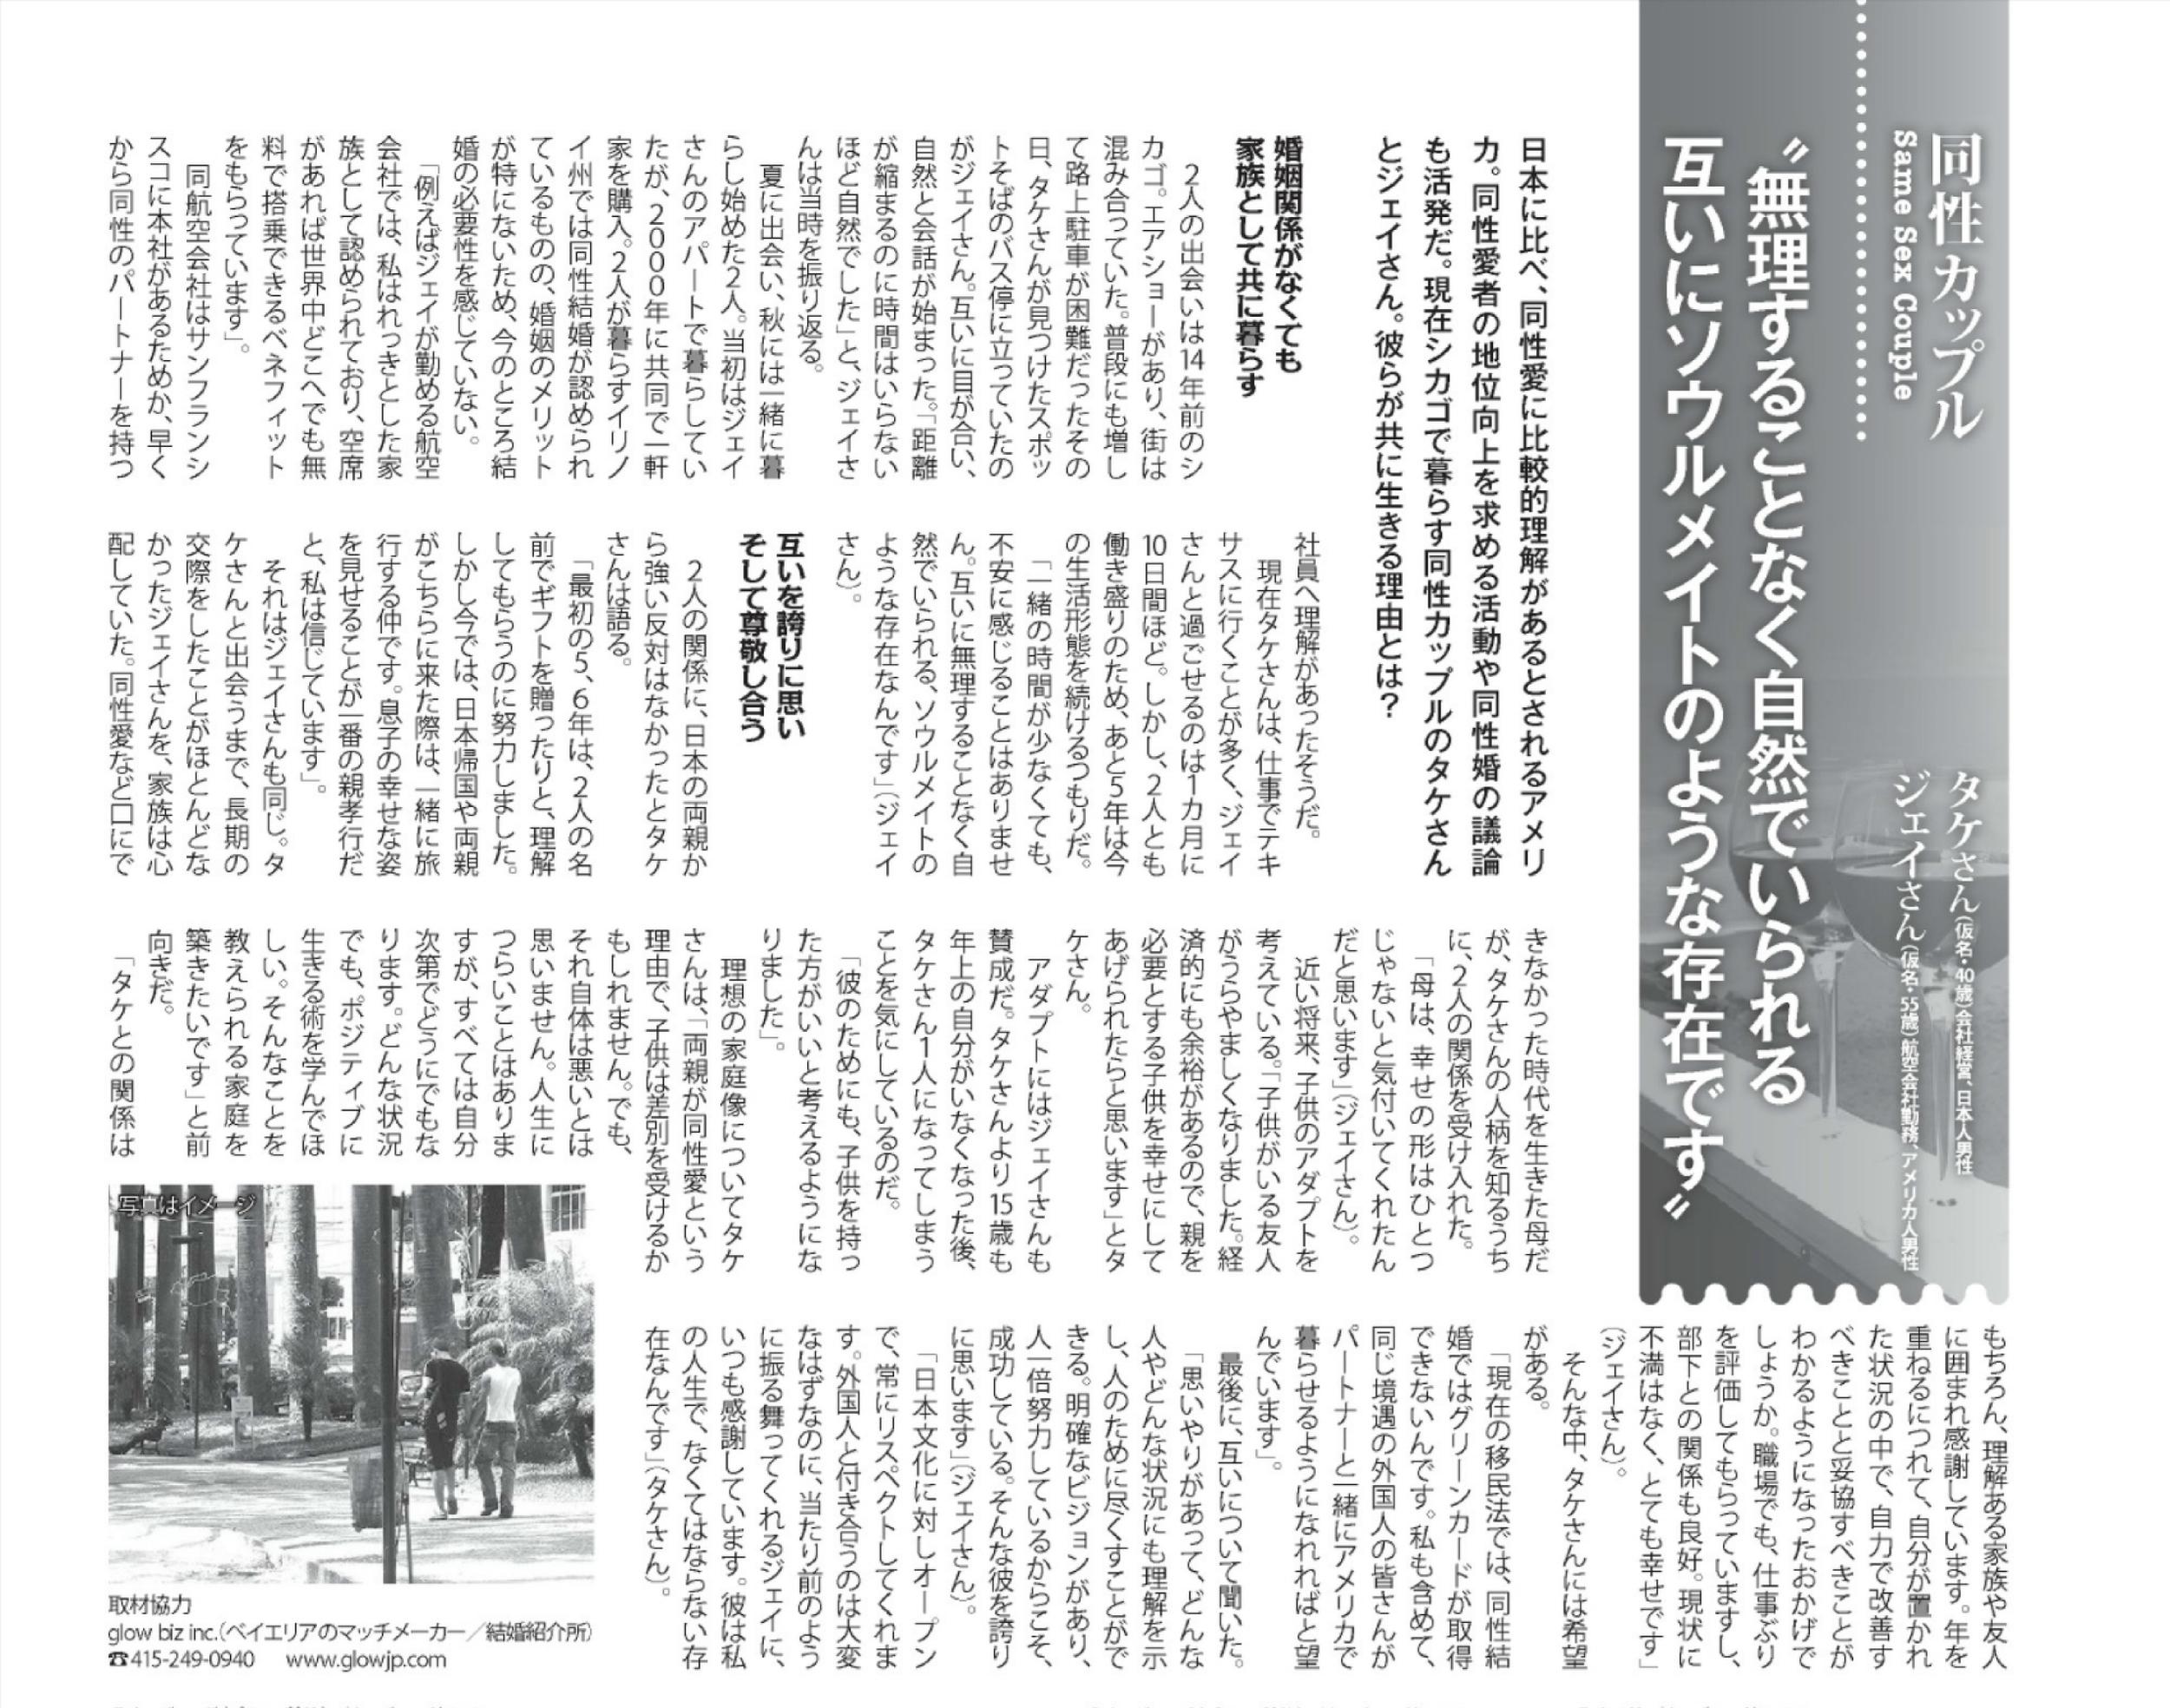 Lighthouse LA May 1, 2012 Page-1-2.jpg